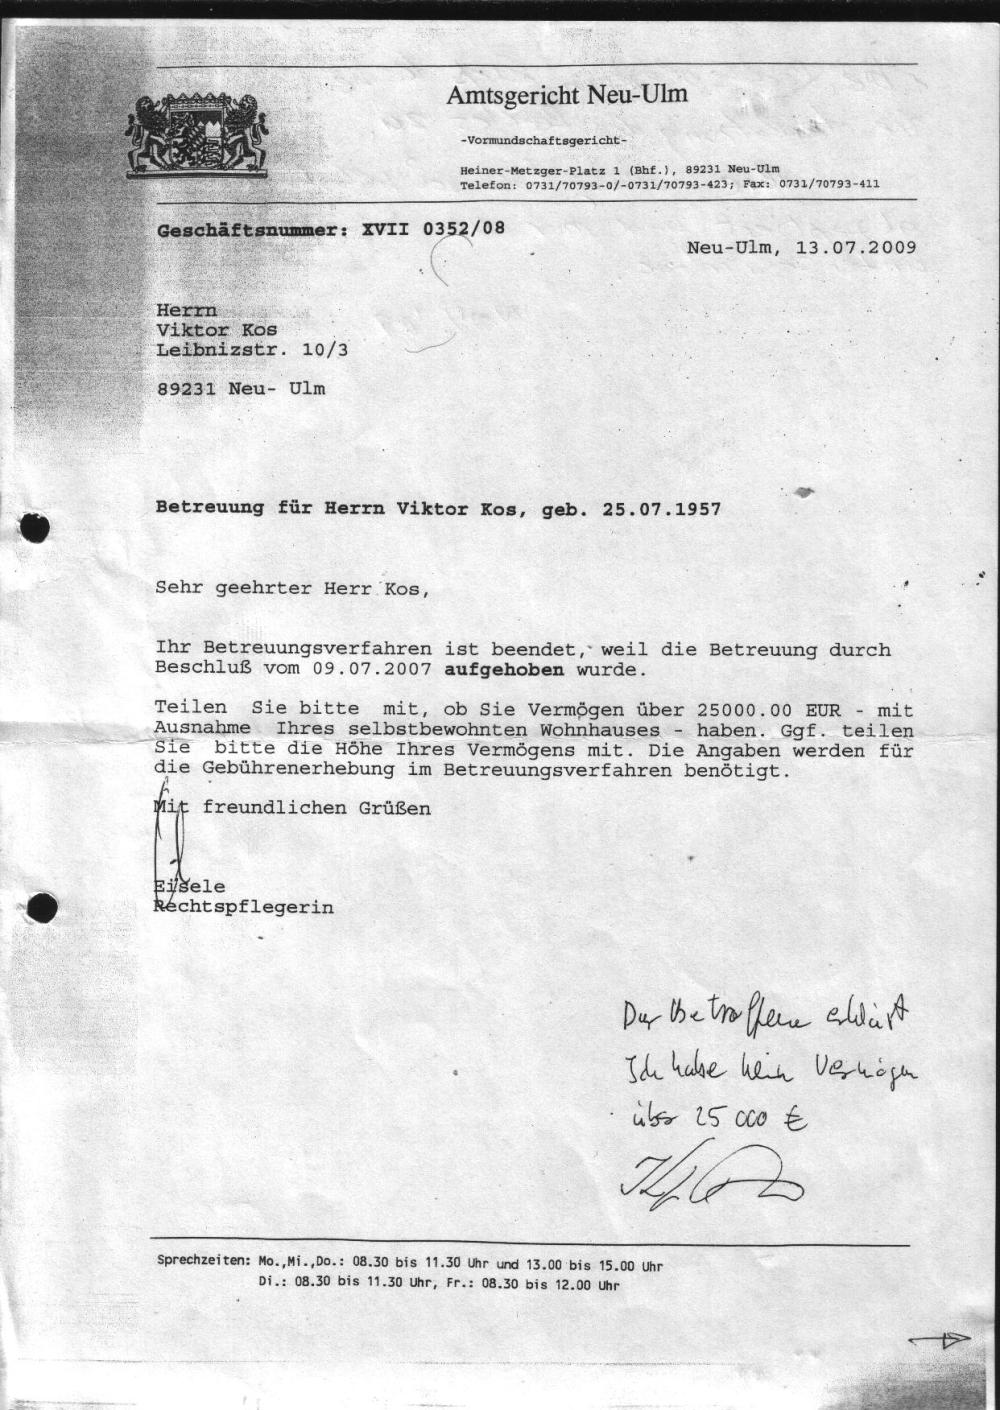 Ende der Betreuung Amtsgericht Betreuung - 13.07.2009. 001